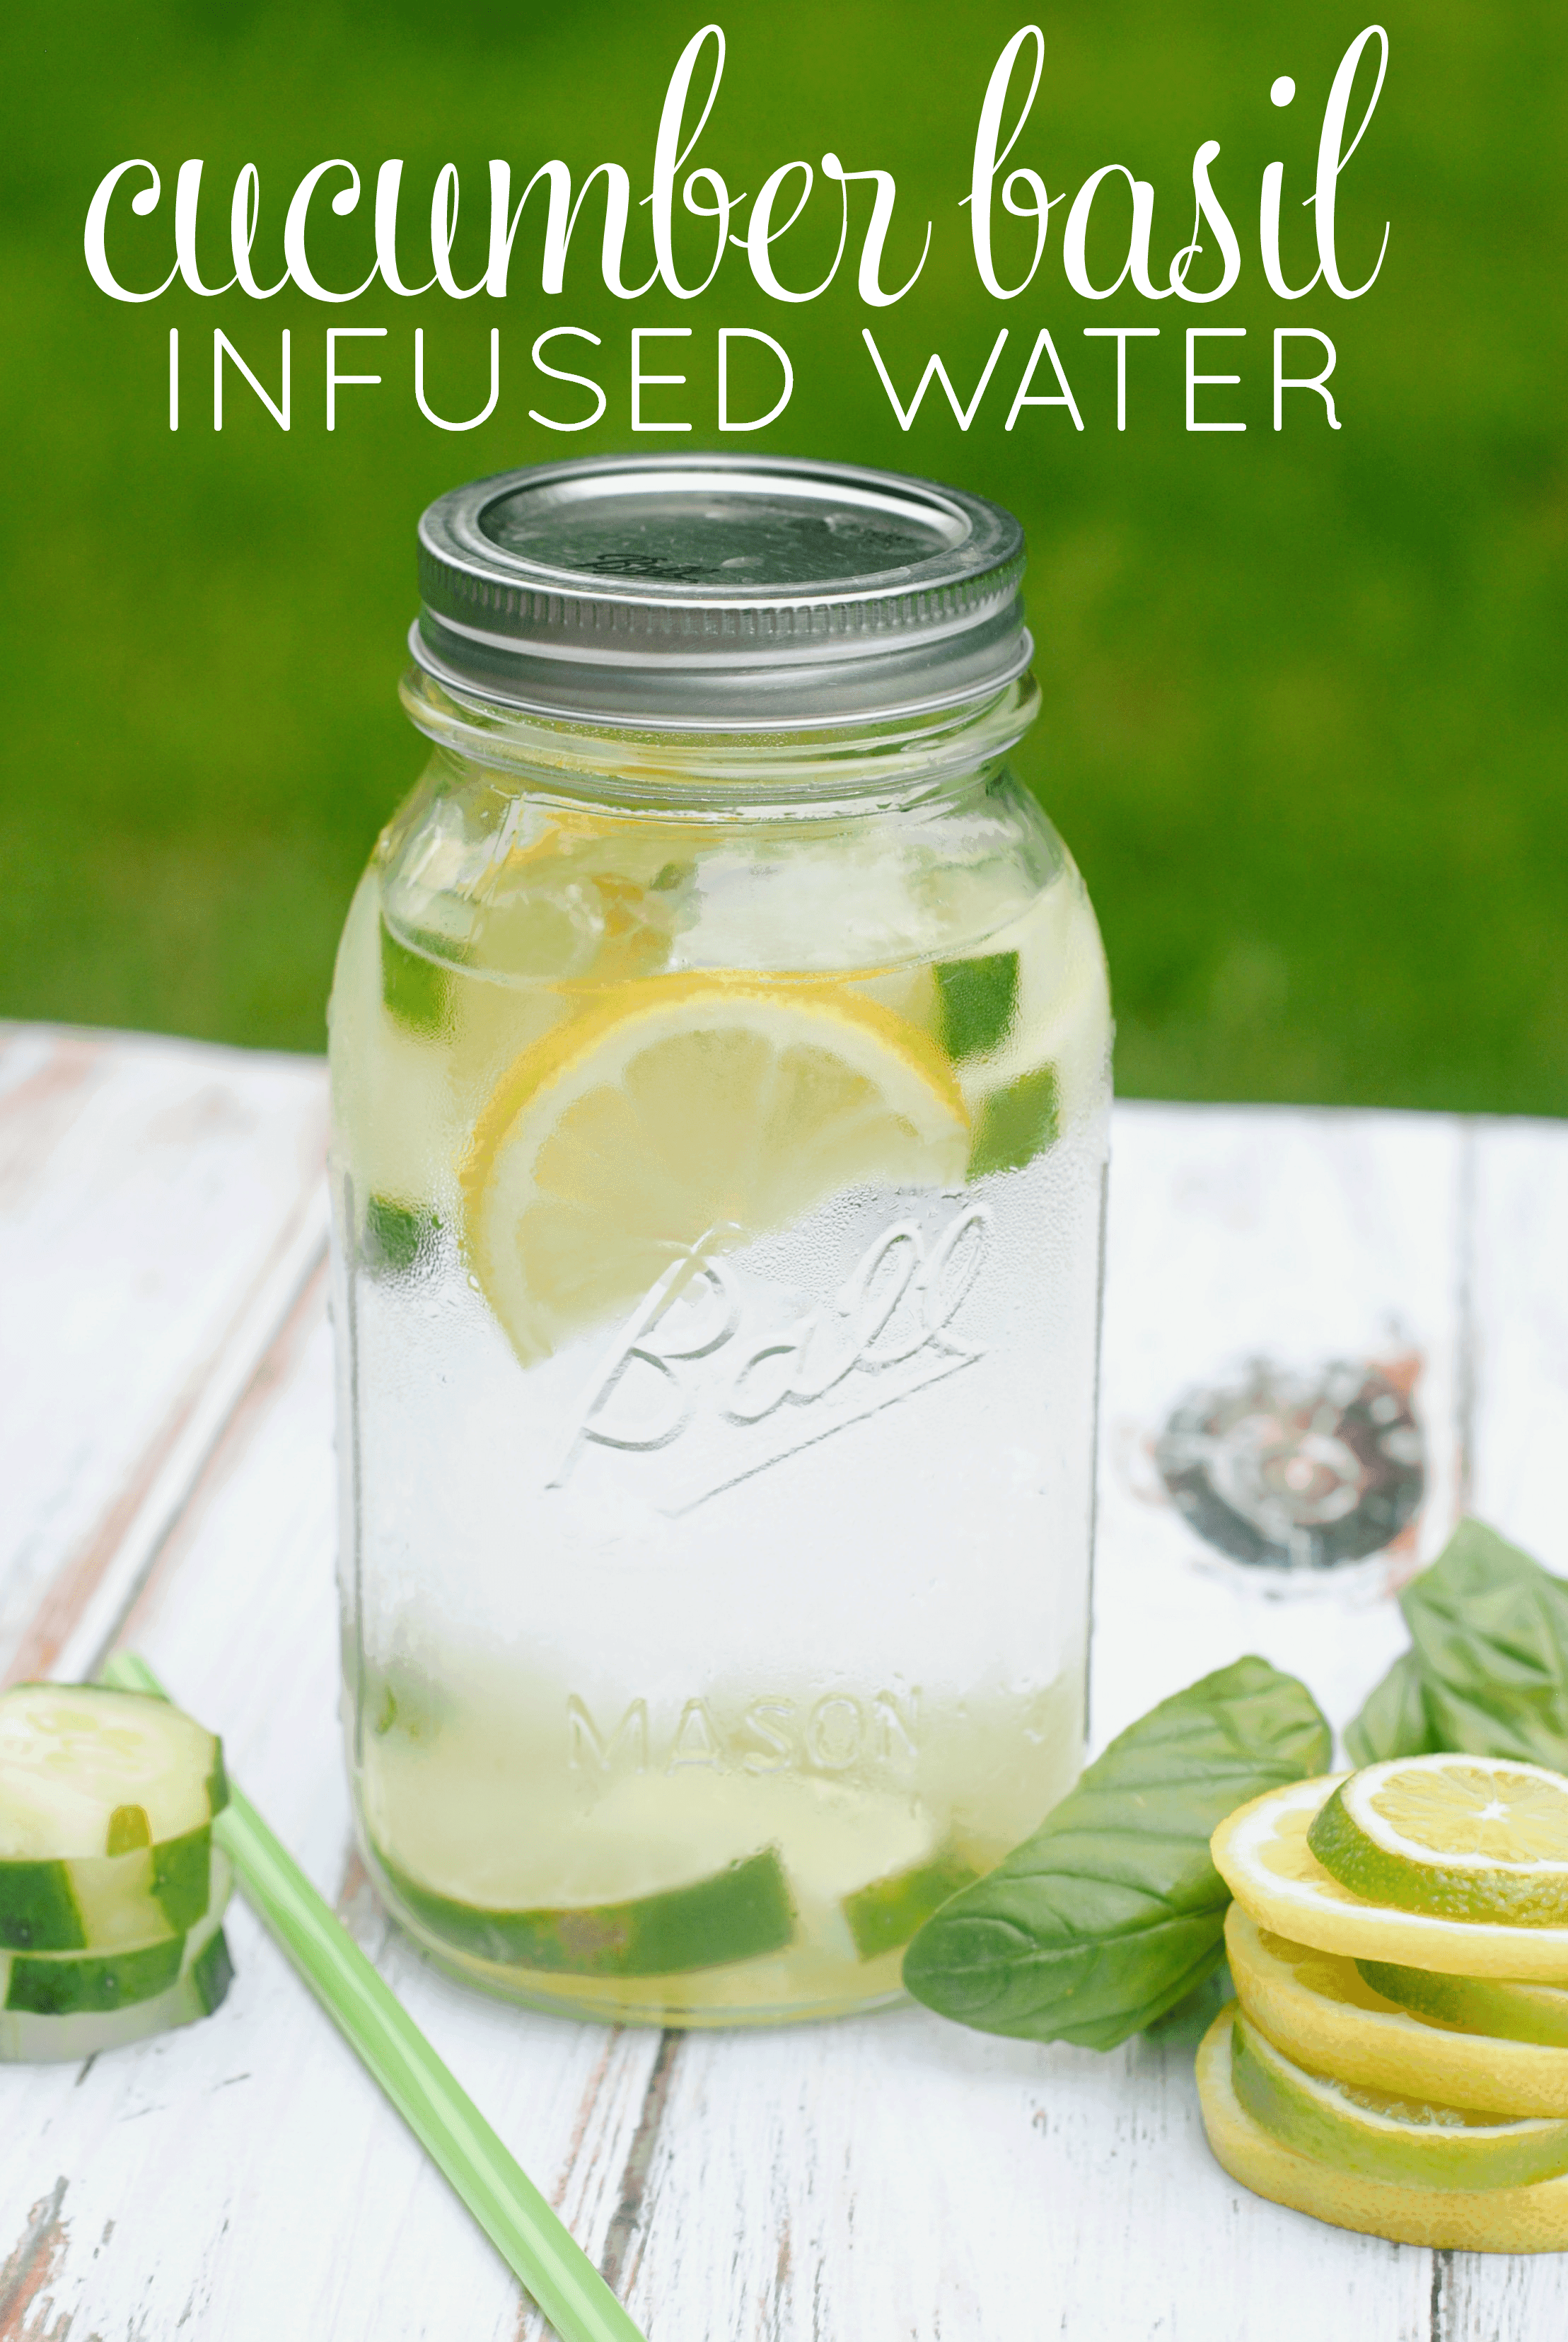 Cucumber Basil Infused Water Recipe